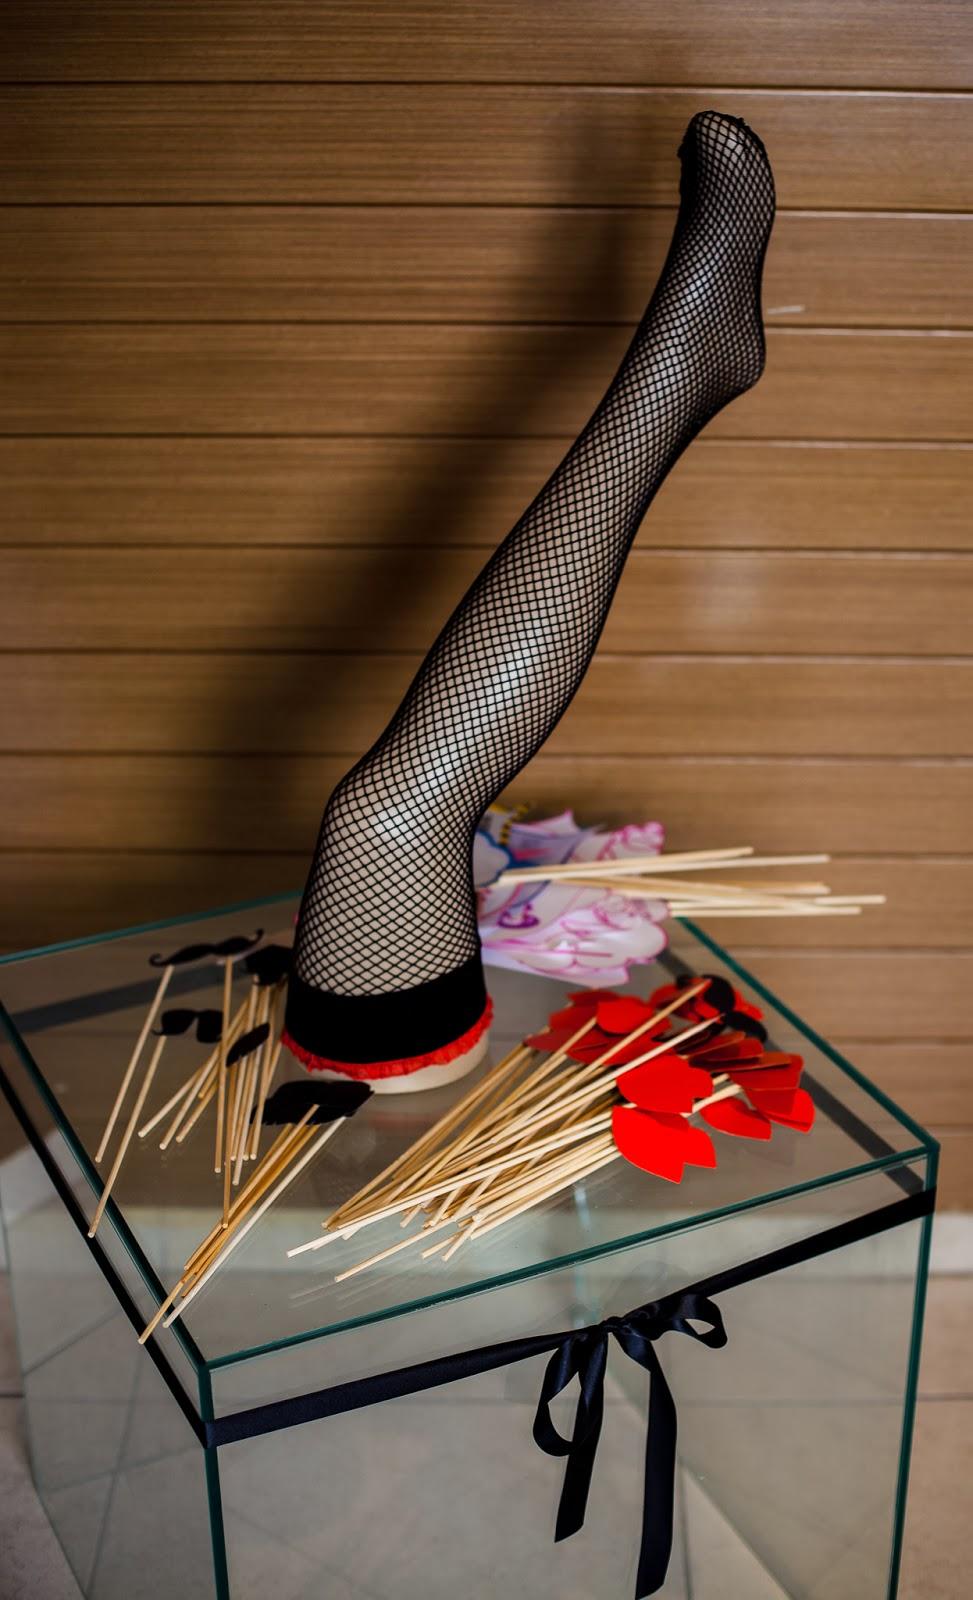 cha-lingerie-decoracao-manequim-photobooth